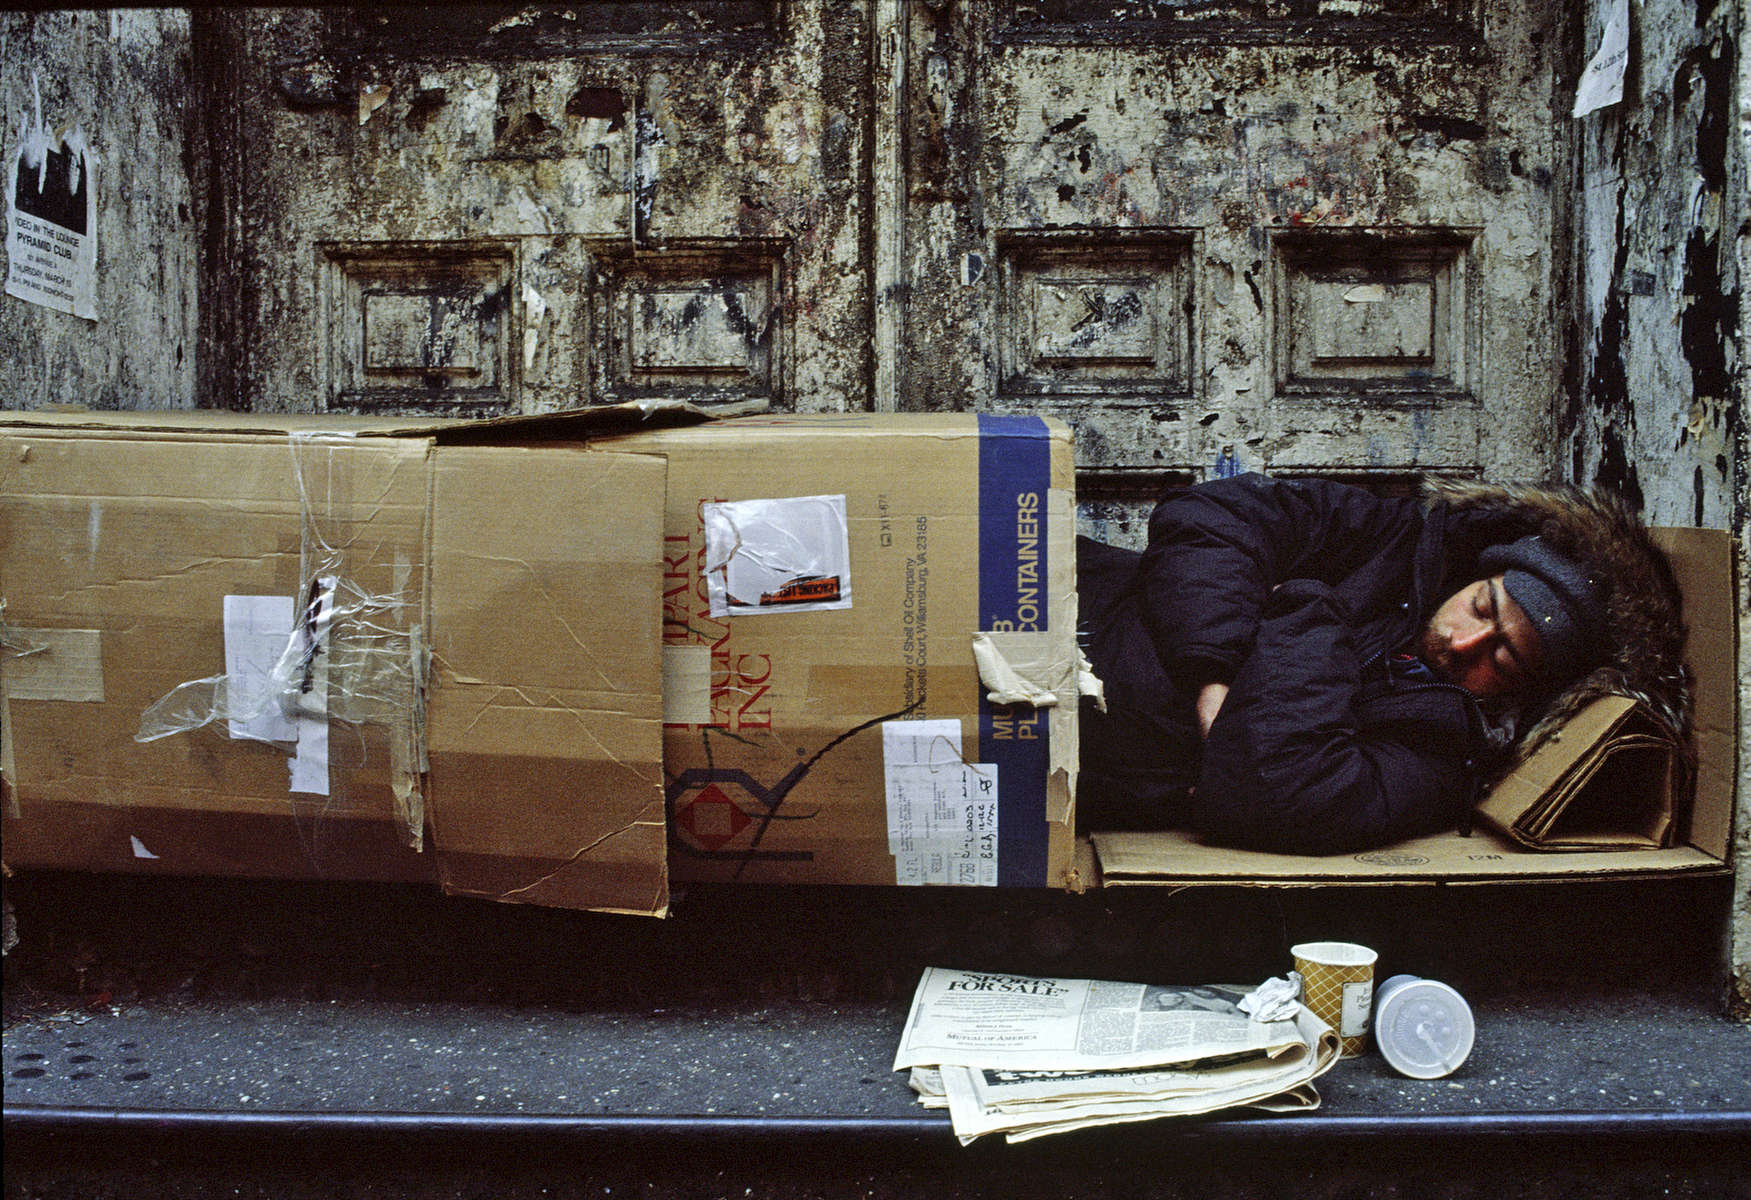 Homeless man sleeping in a cardboard box.